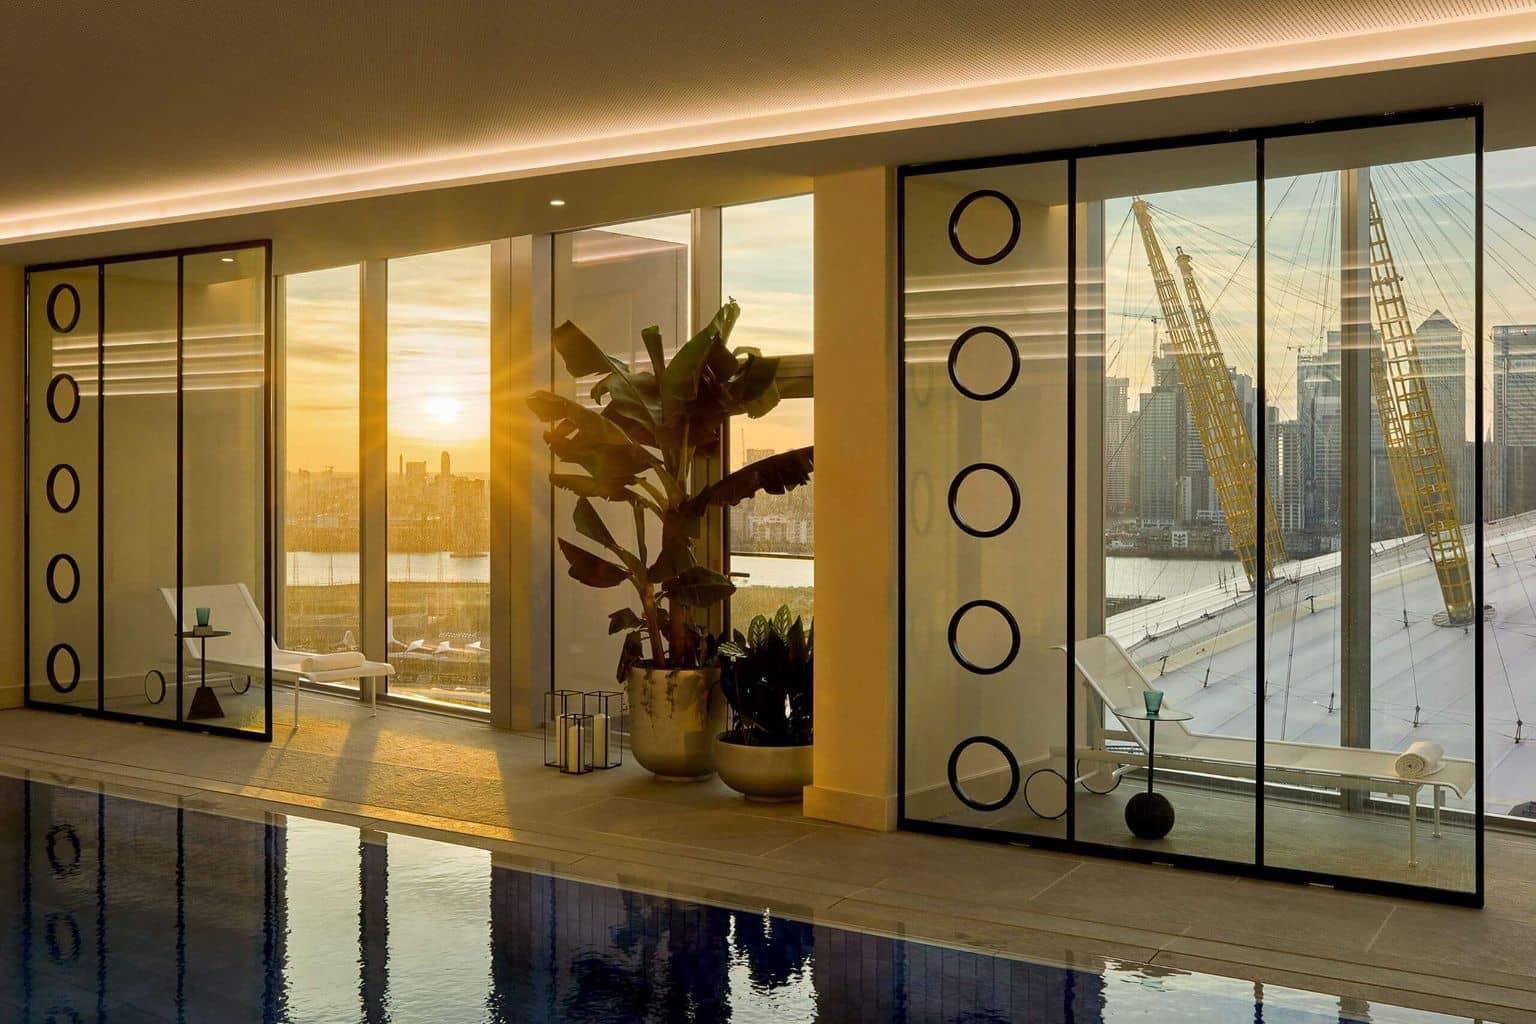 swim in one of London's highest indoor pools